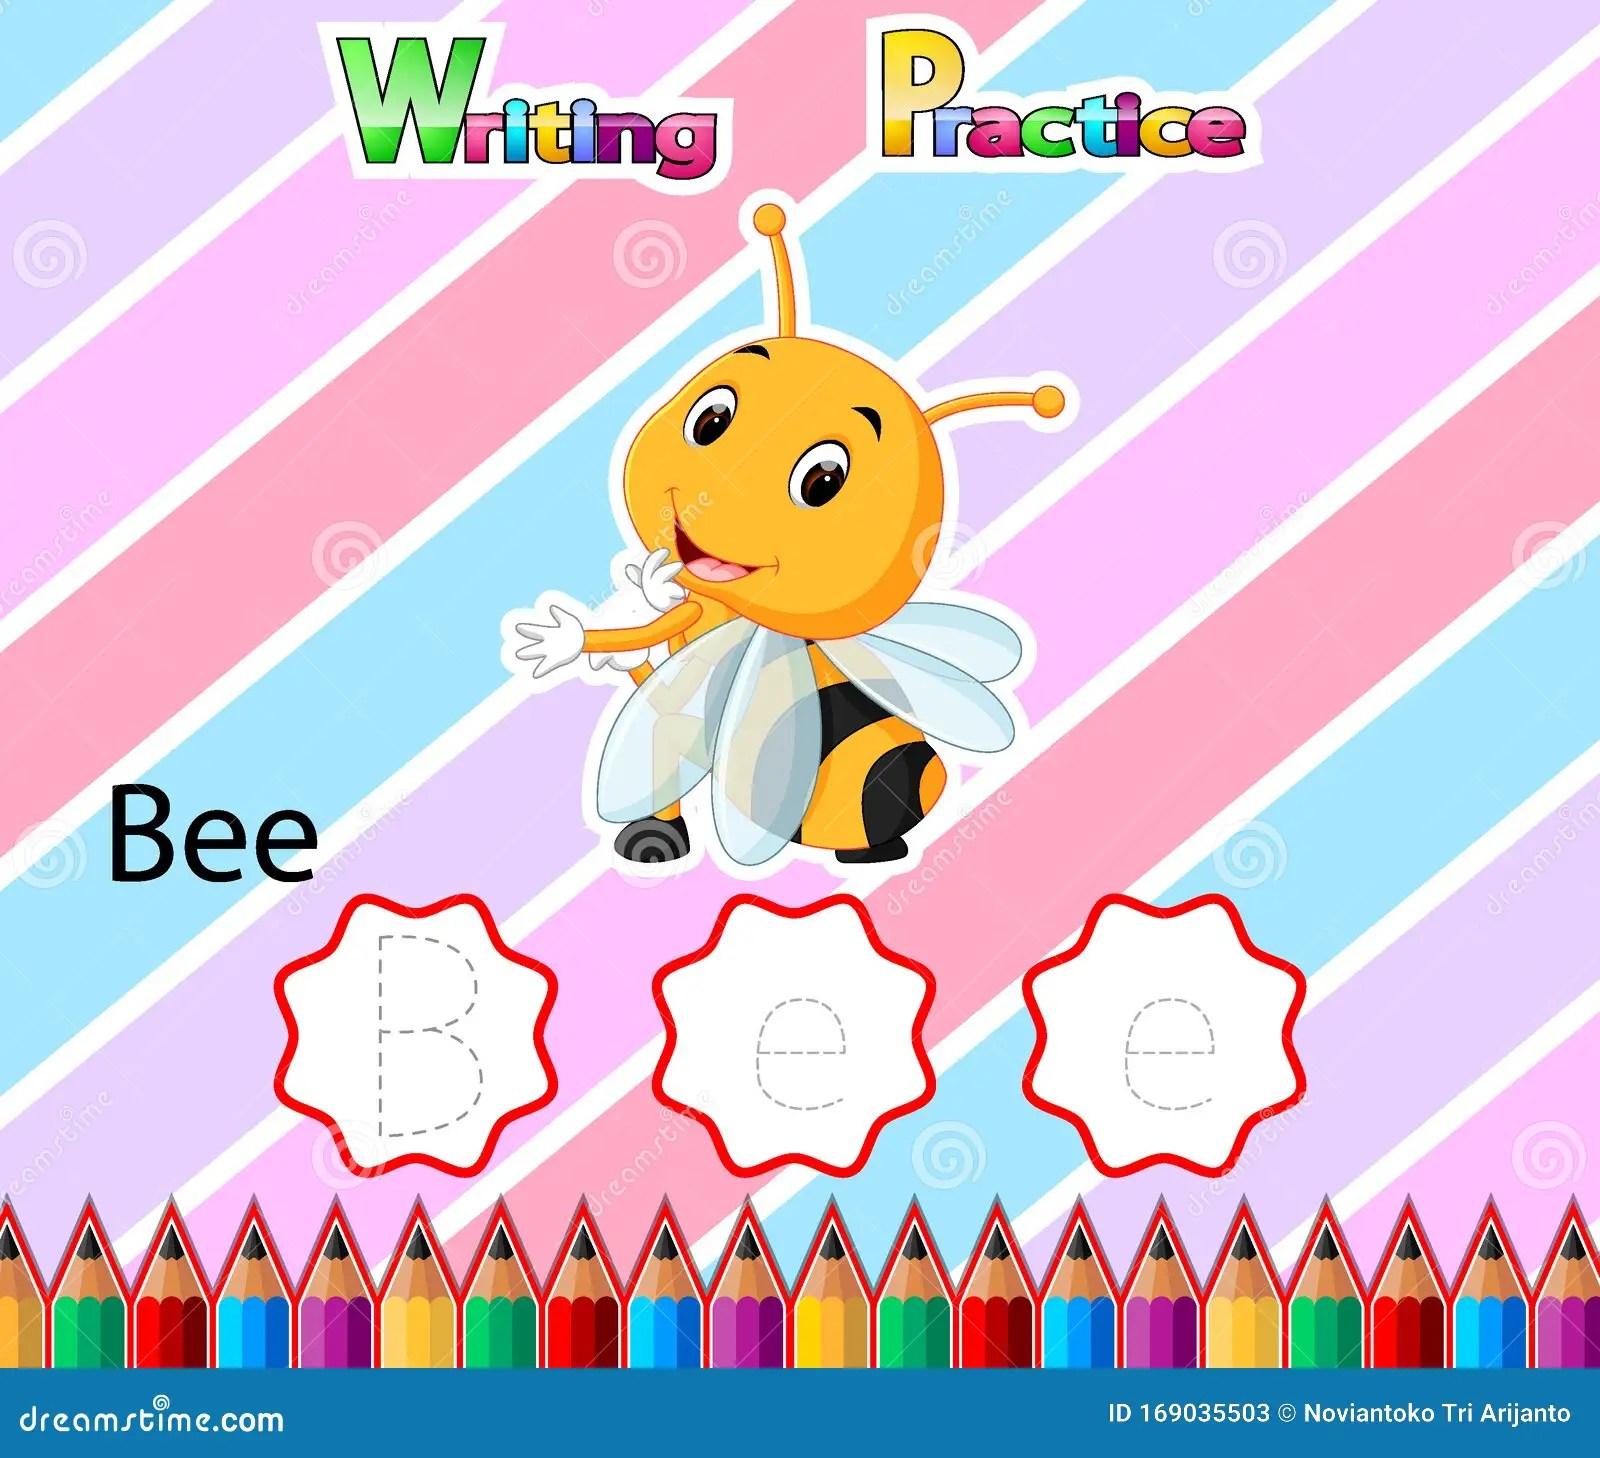 Worksheet Writing Practice Alphabet B For Bee Stock Vector